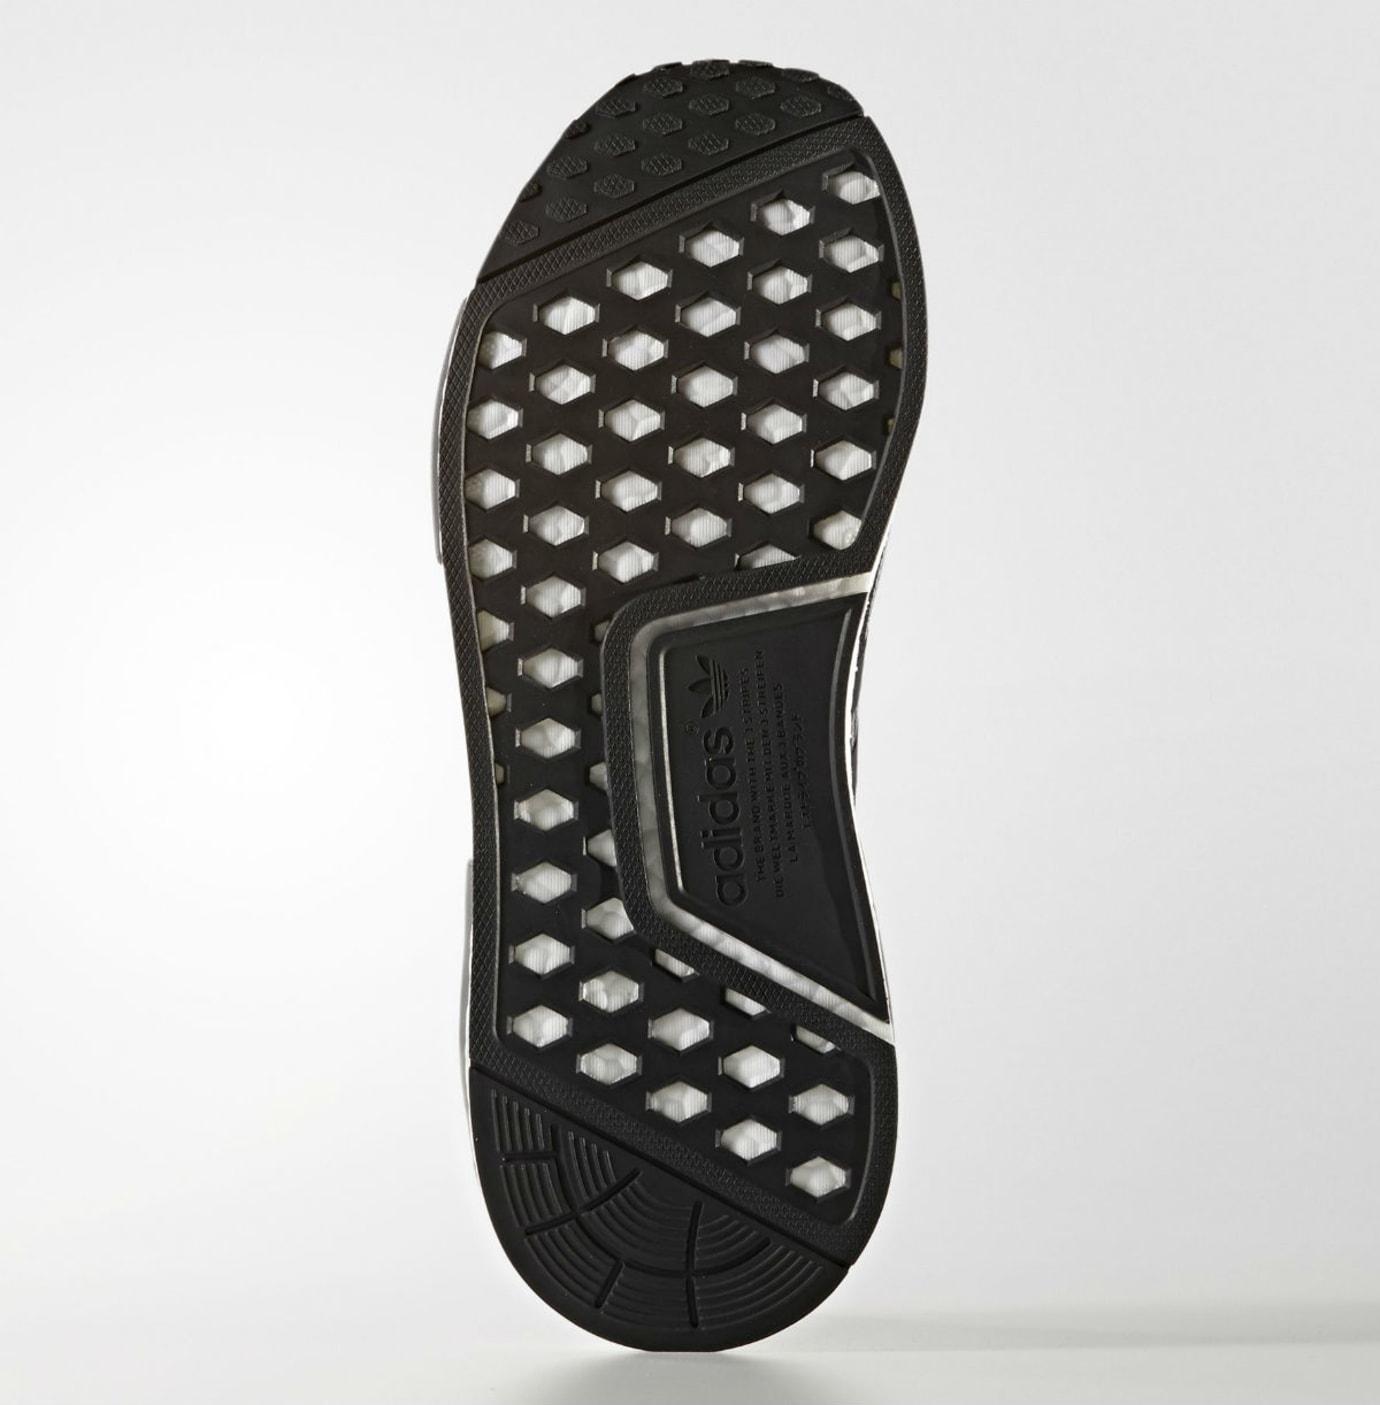 Adidas NMD R1 Primeknit Glitch Camo Core Black Grey Three